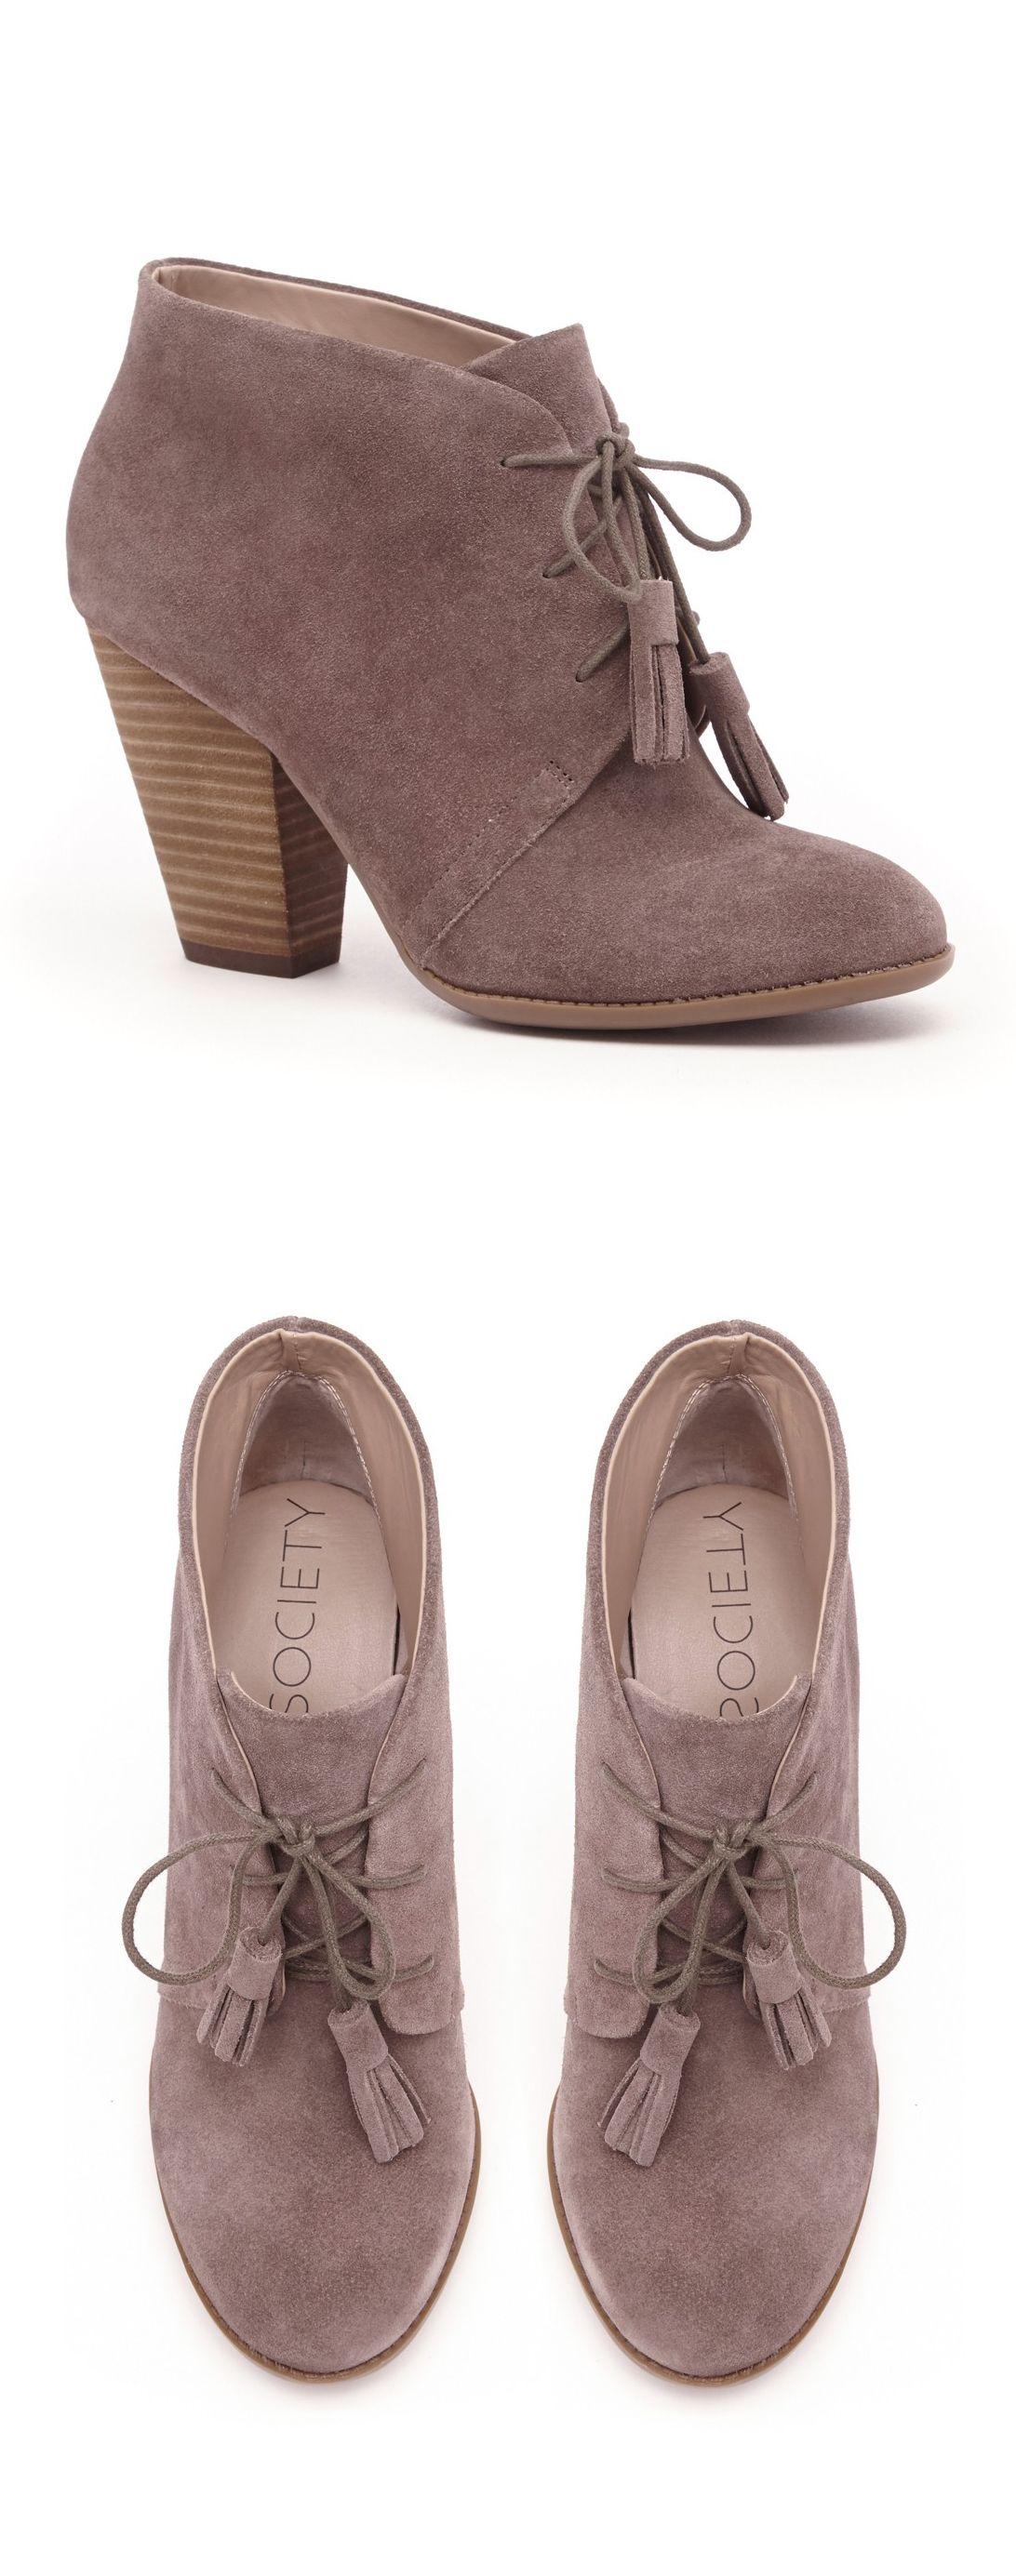 6f01e5df2 Cute booties for fall | Shoes & Socks | Pinterest | Sapato, Pezinho ...